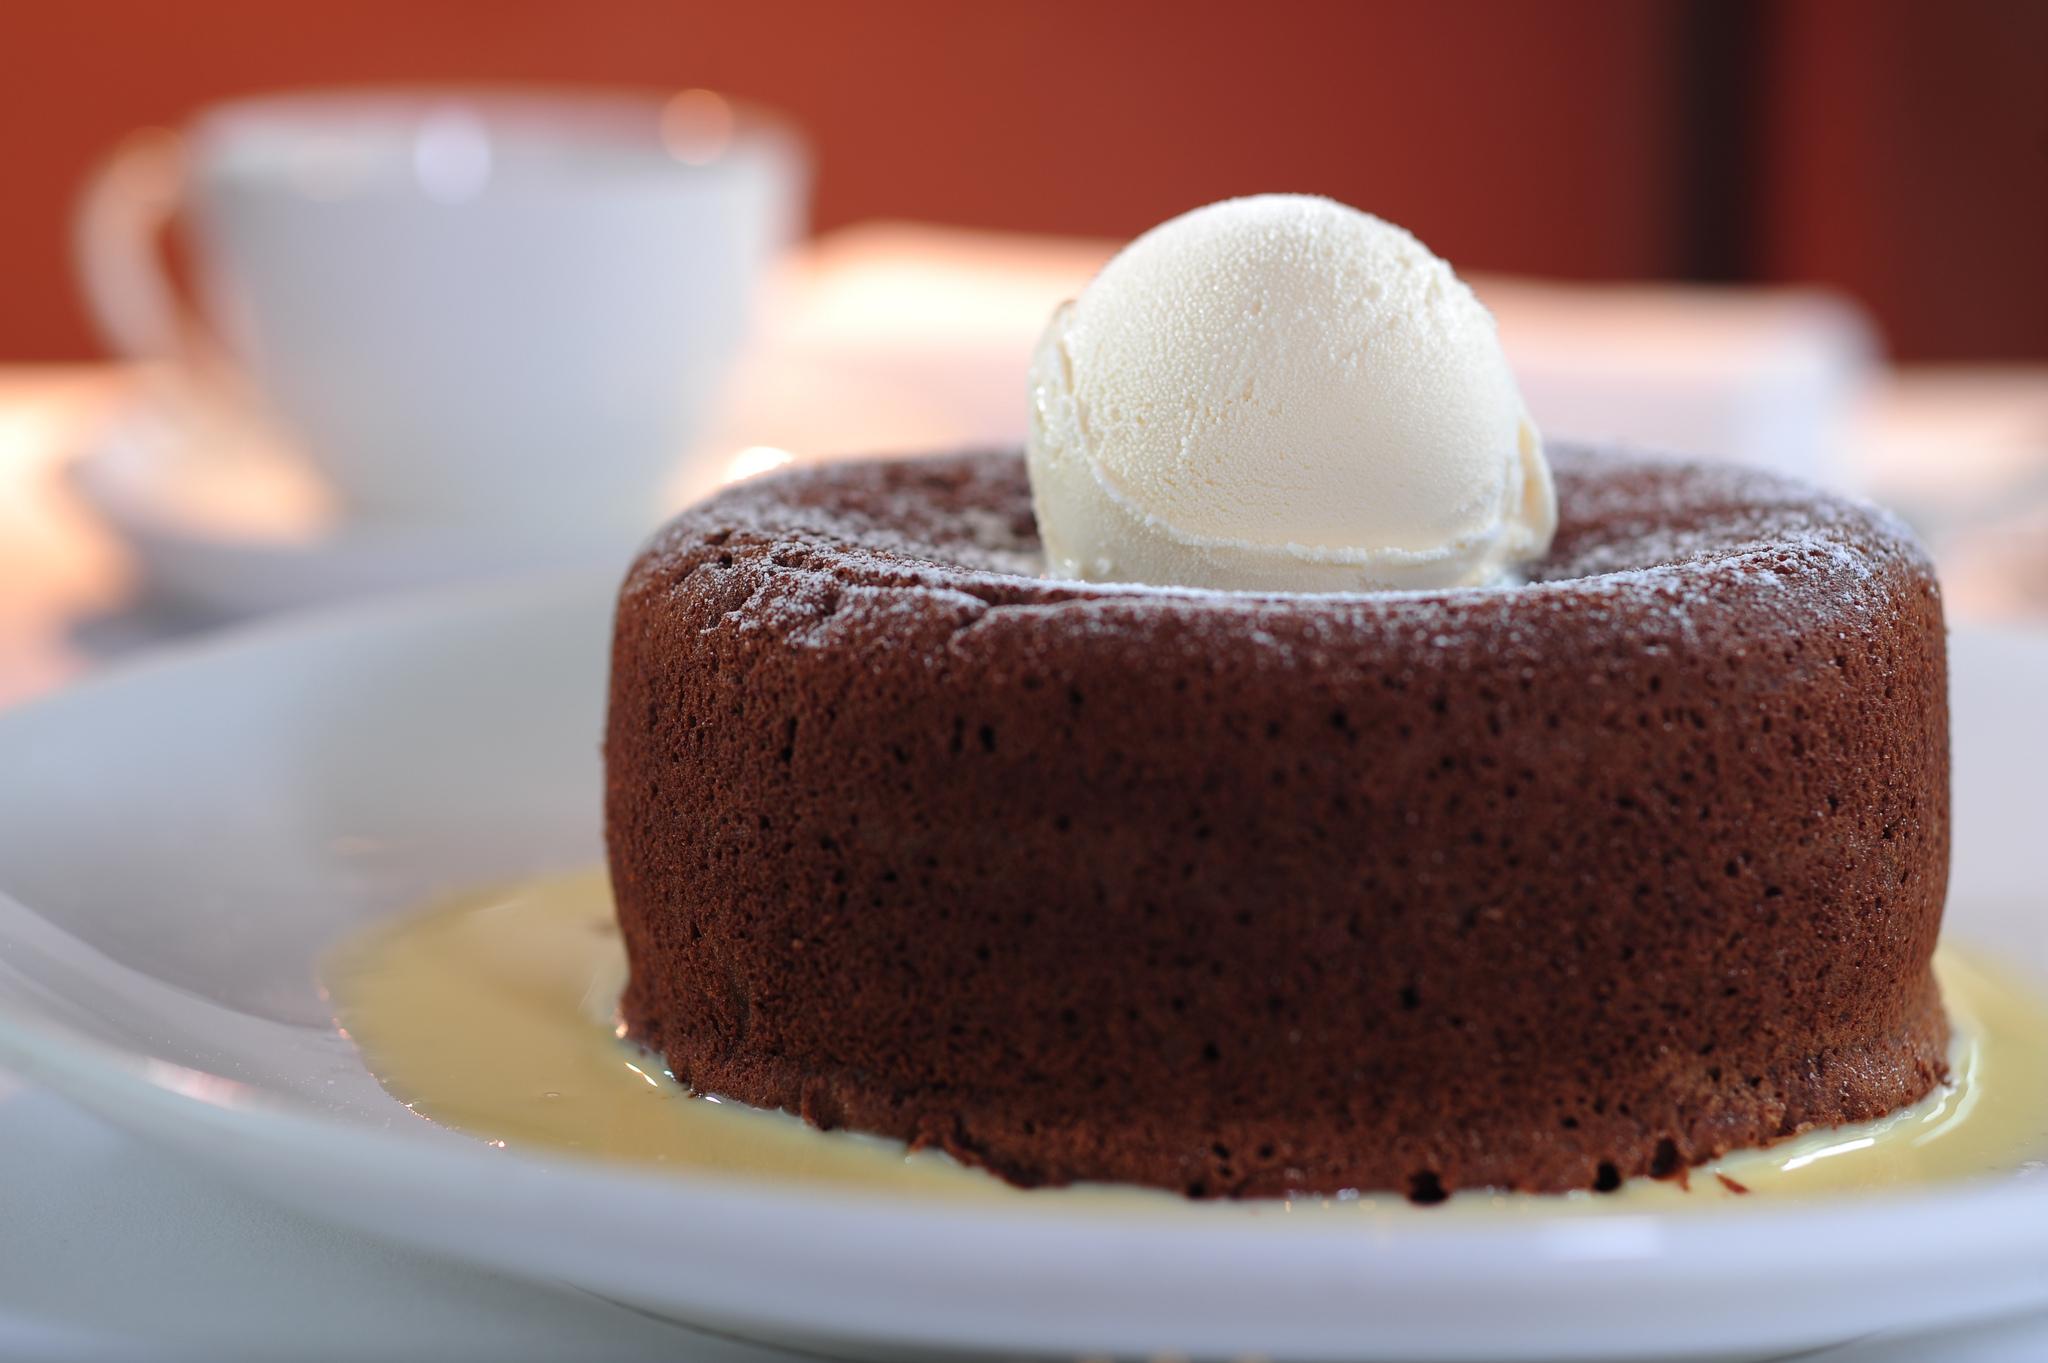 Signature dish? - Chocolate fondant